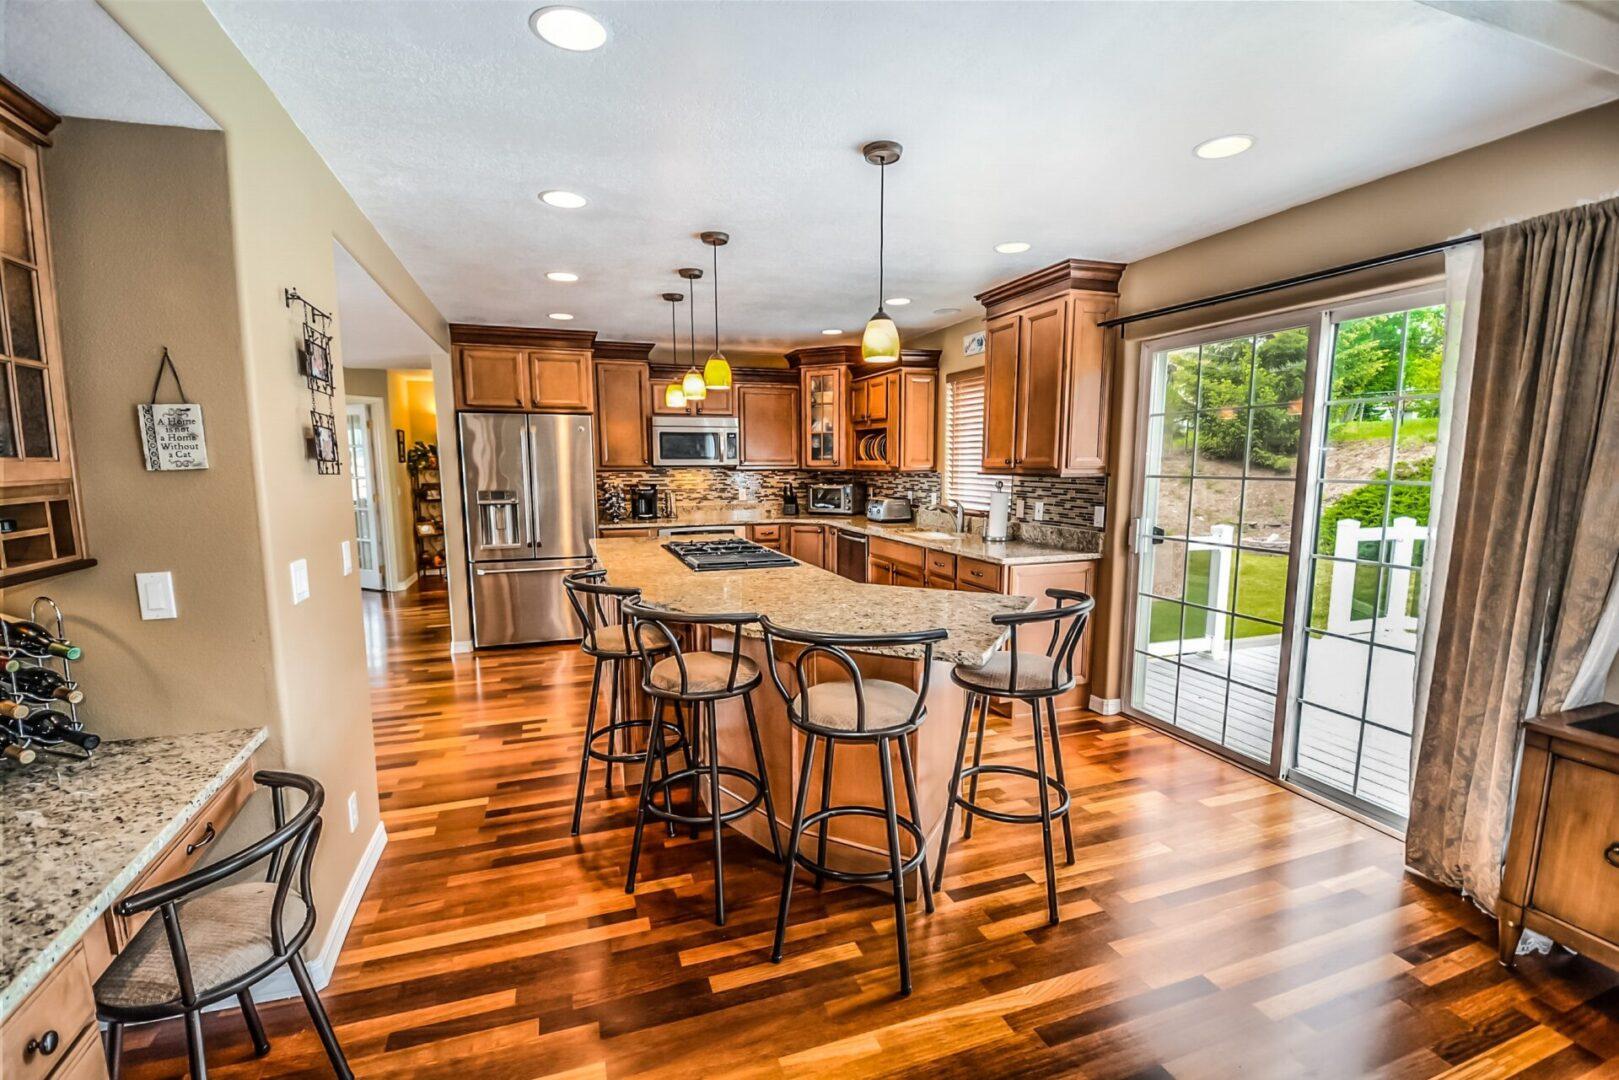 Omaha Home Improvement